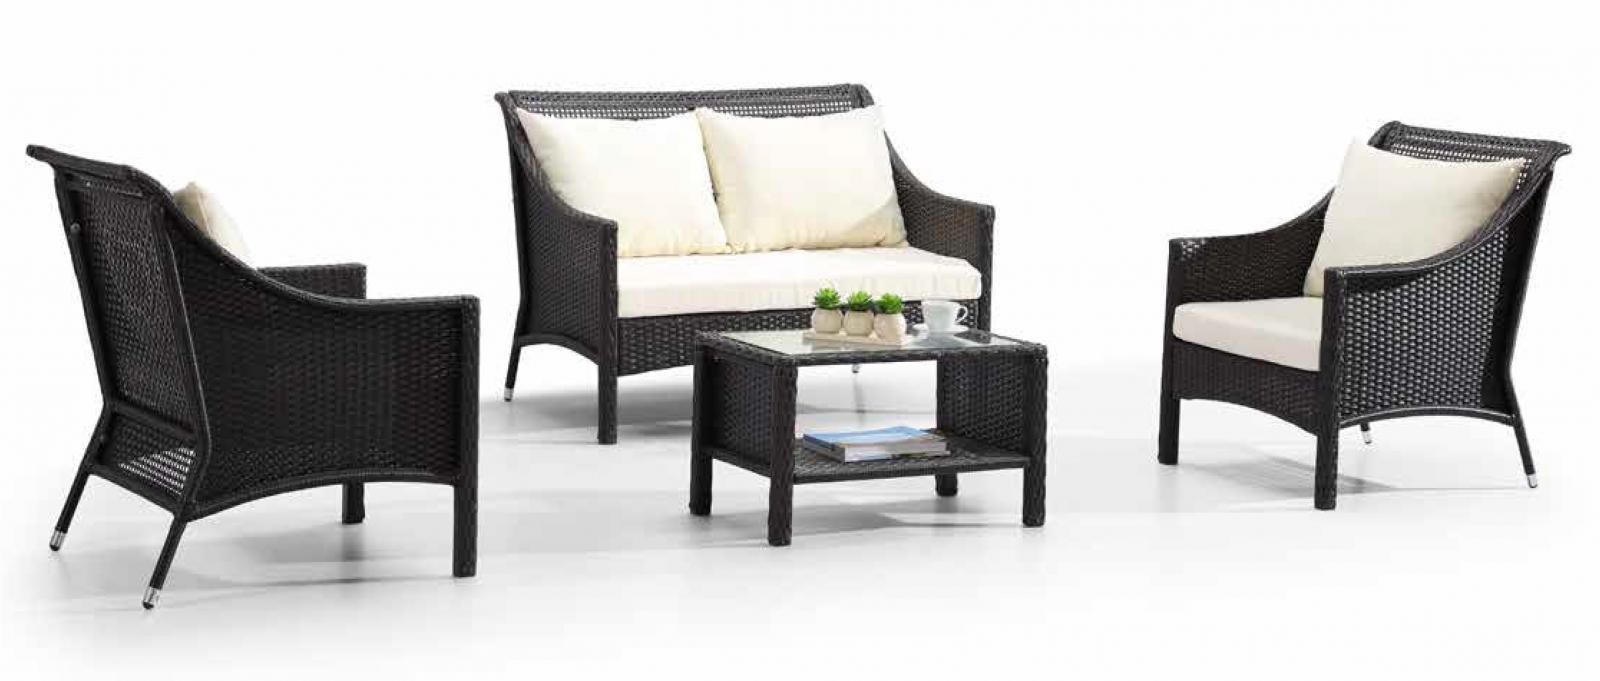 Комплект плетеной мебели Monika